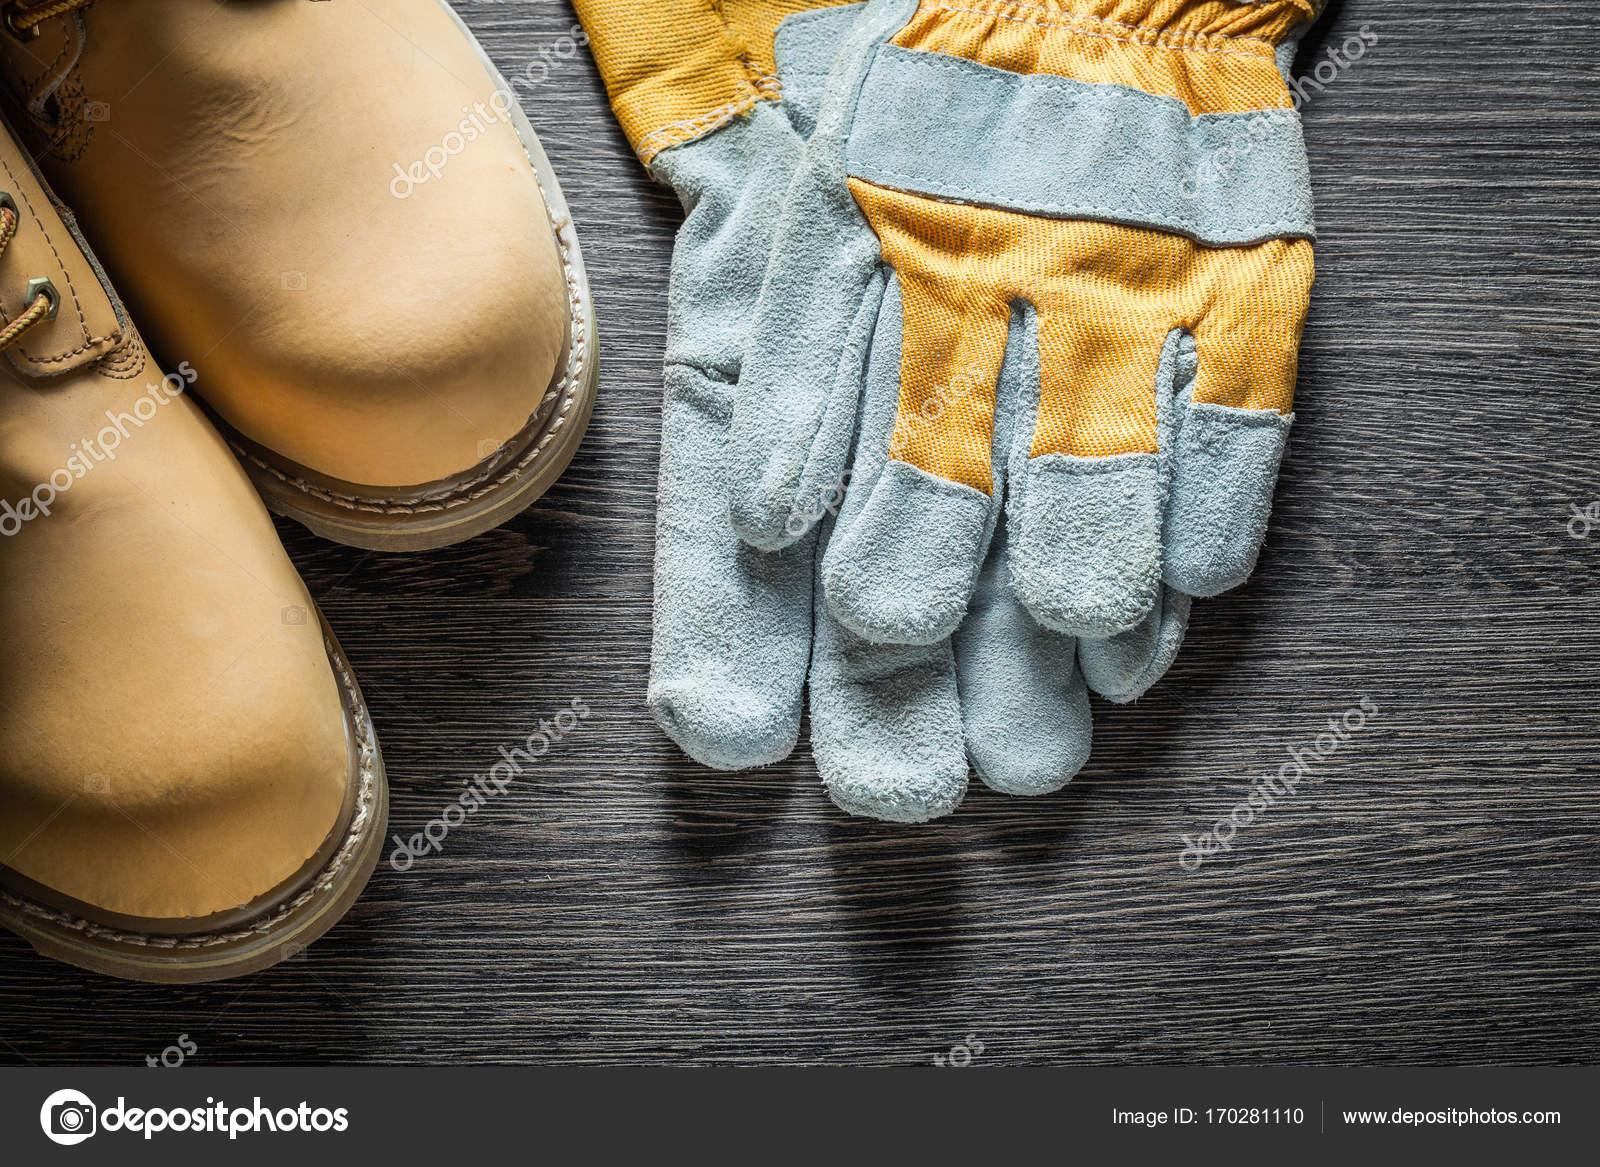 767630905e2 Ασφάλεια γάντια ξύλινη σανίδα μπότες εργασίας — Φωτογραφία Αρχείου ...